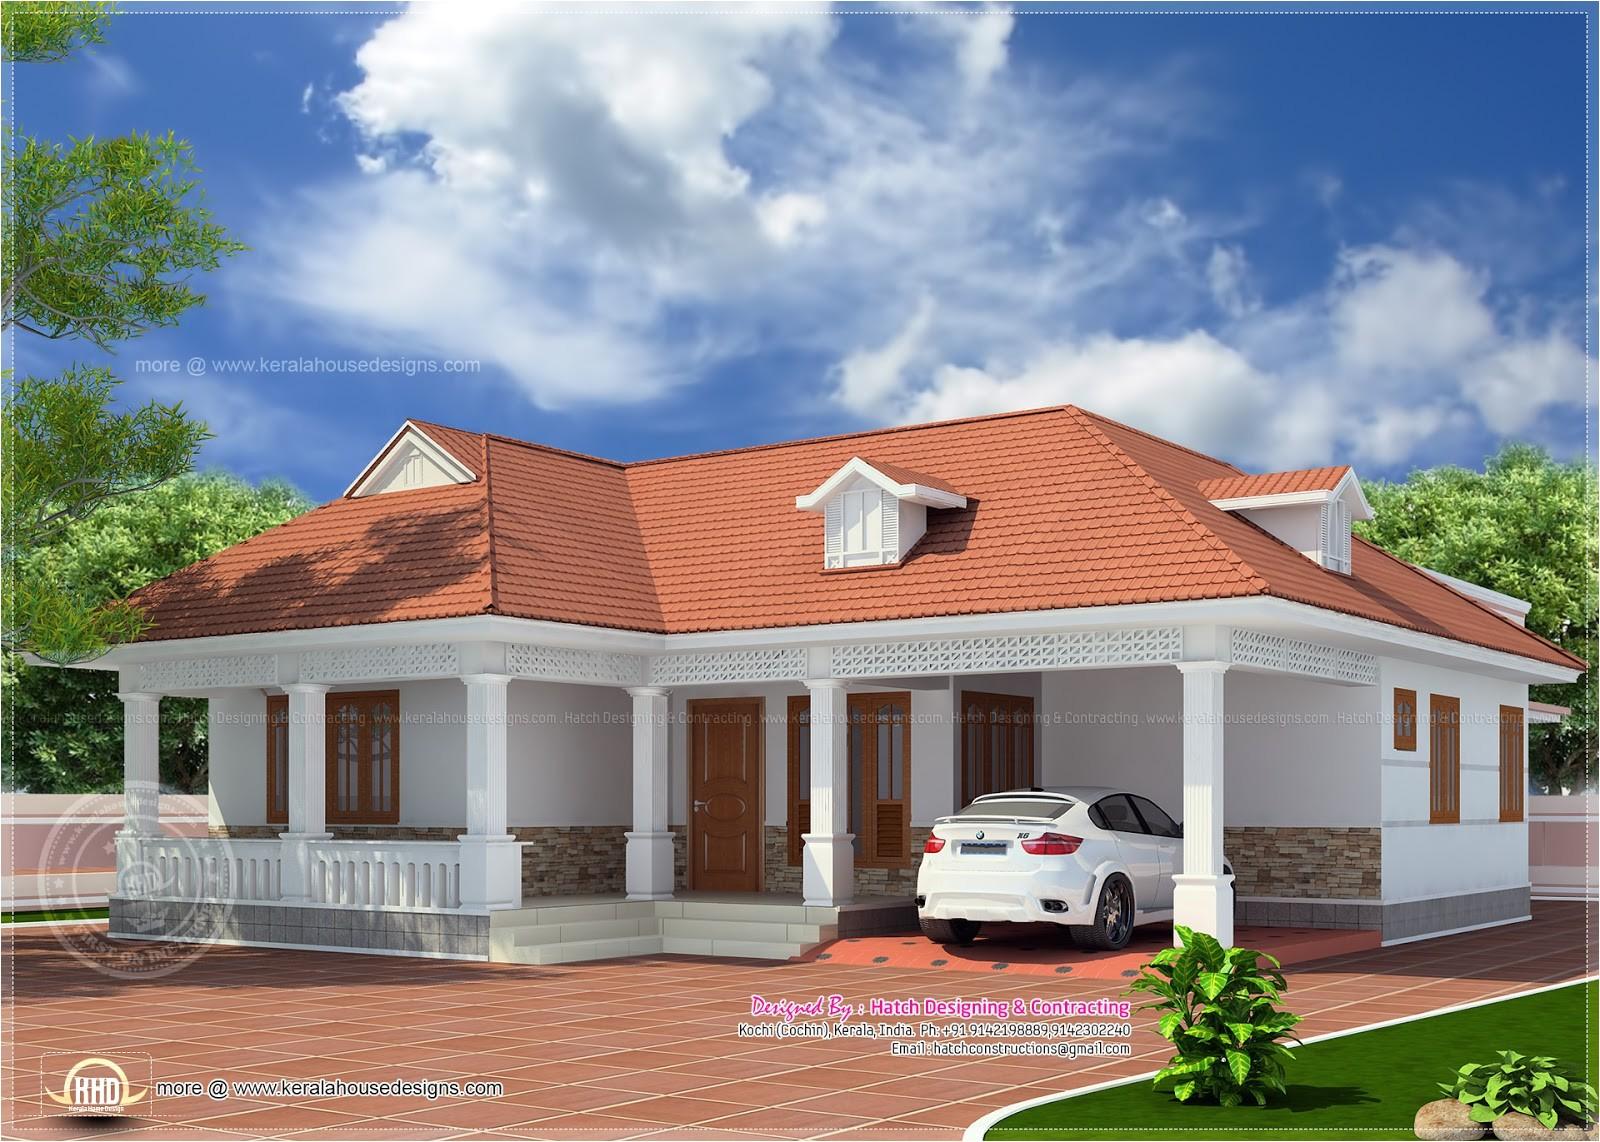 1850 sqfeet kerala style home elevation